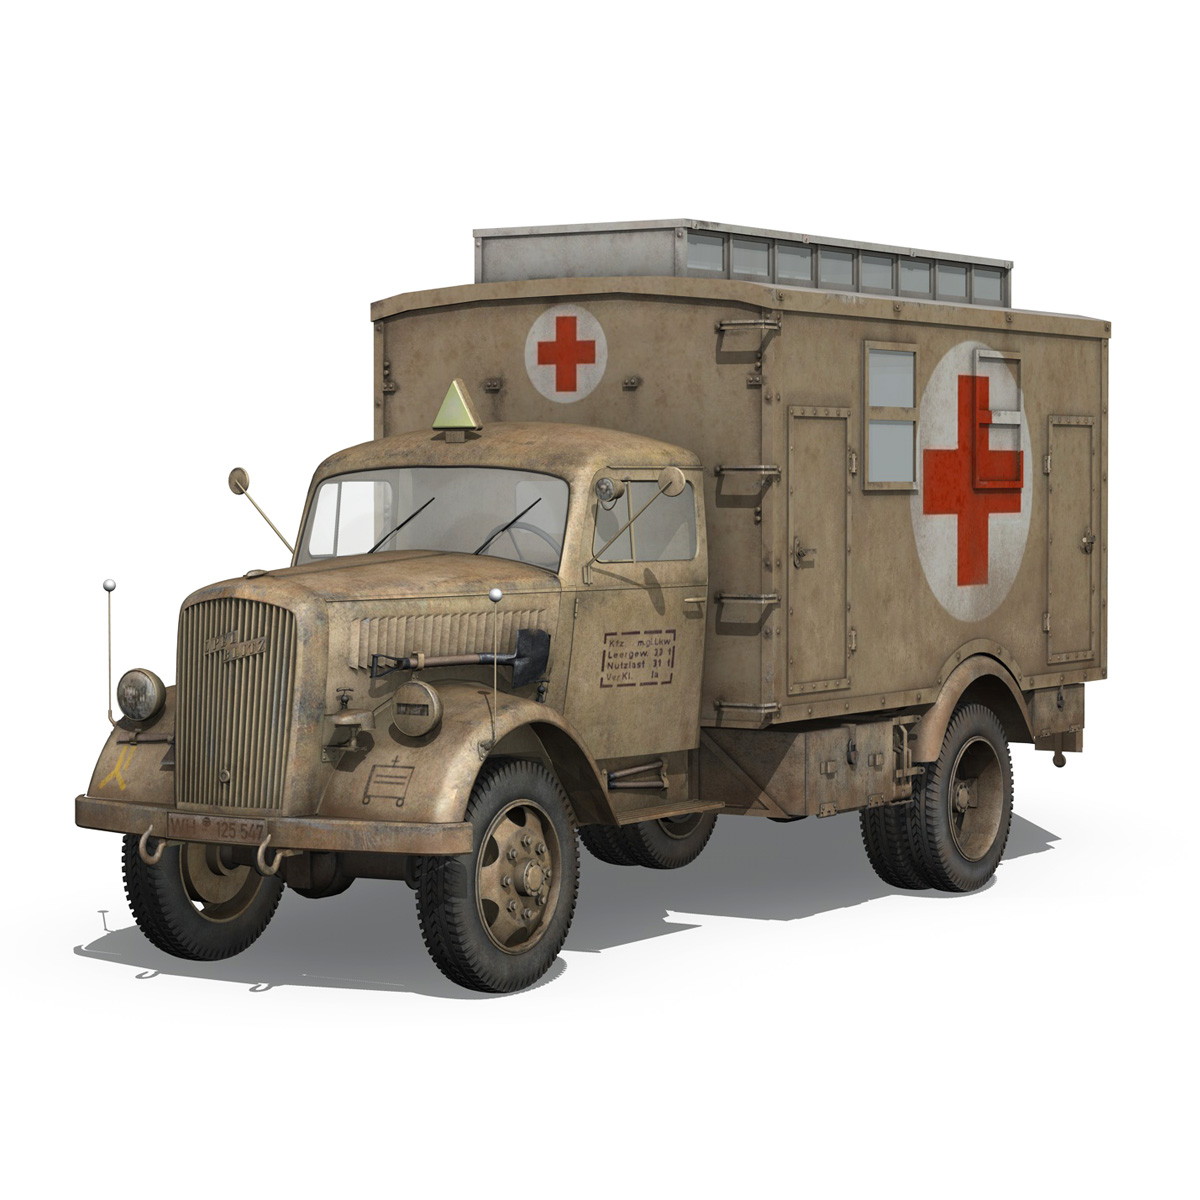 opel blitz – 3t ambulance truck – 2 pzdiv 3d model 3ds c4d fbx lwo lw lws obj 265754